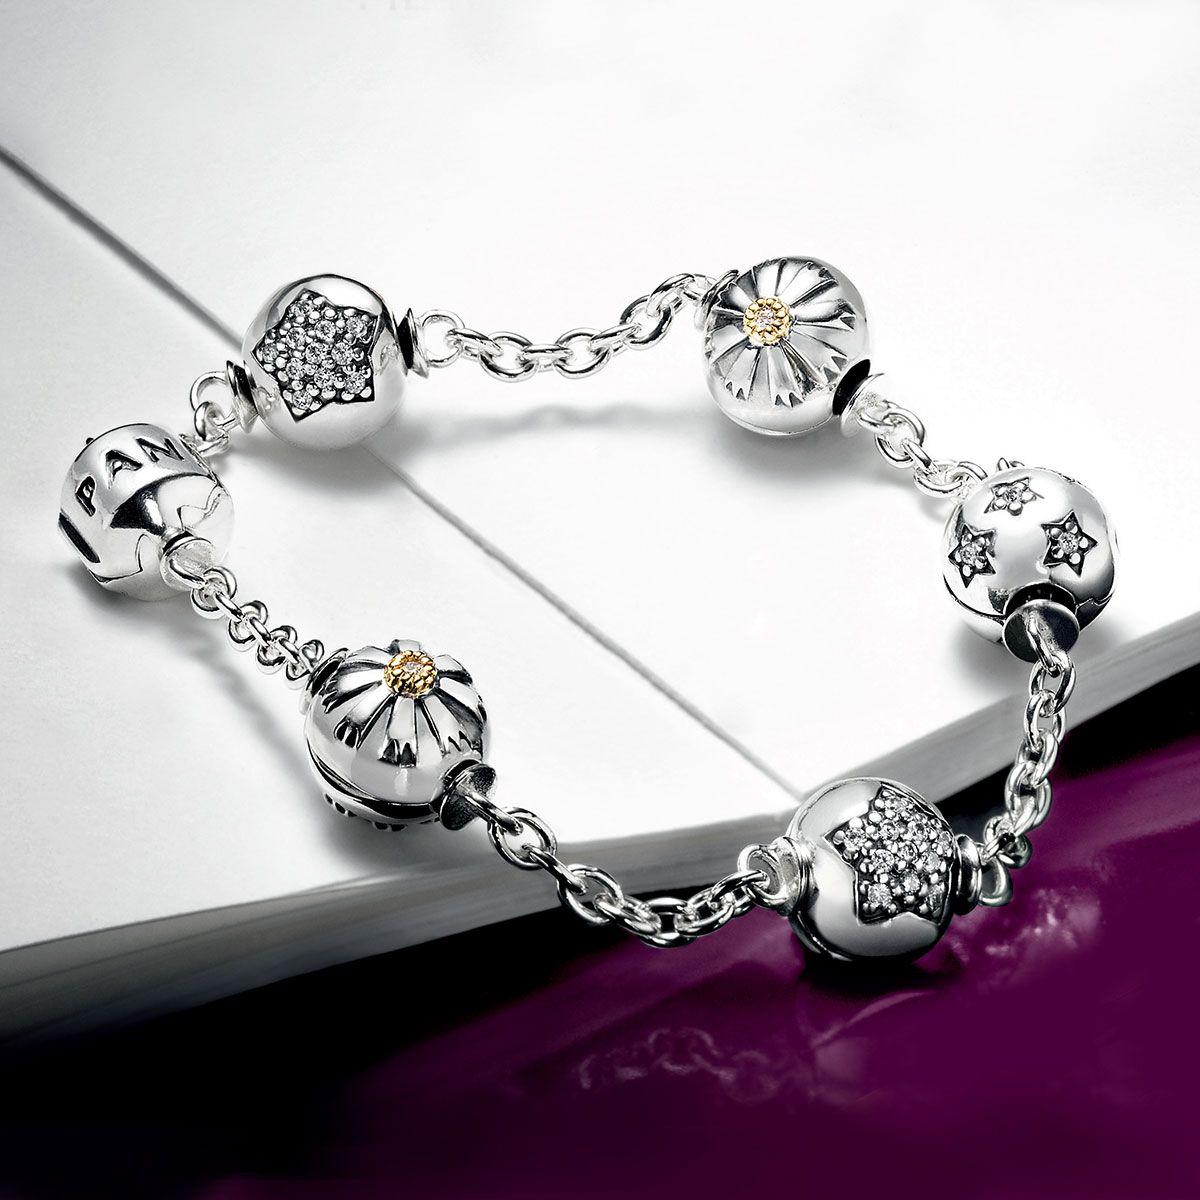 Pandora Capture 5 Clip Station Bracelet Star Clips And Friendship Clips